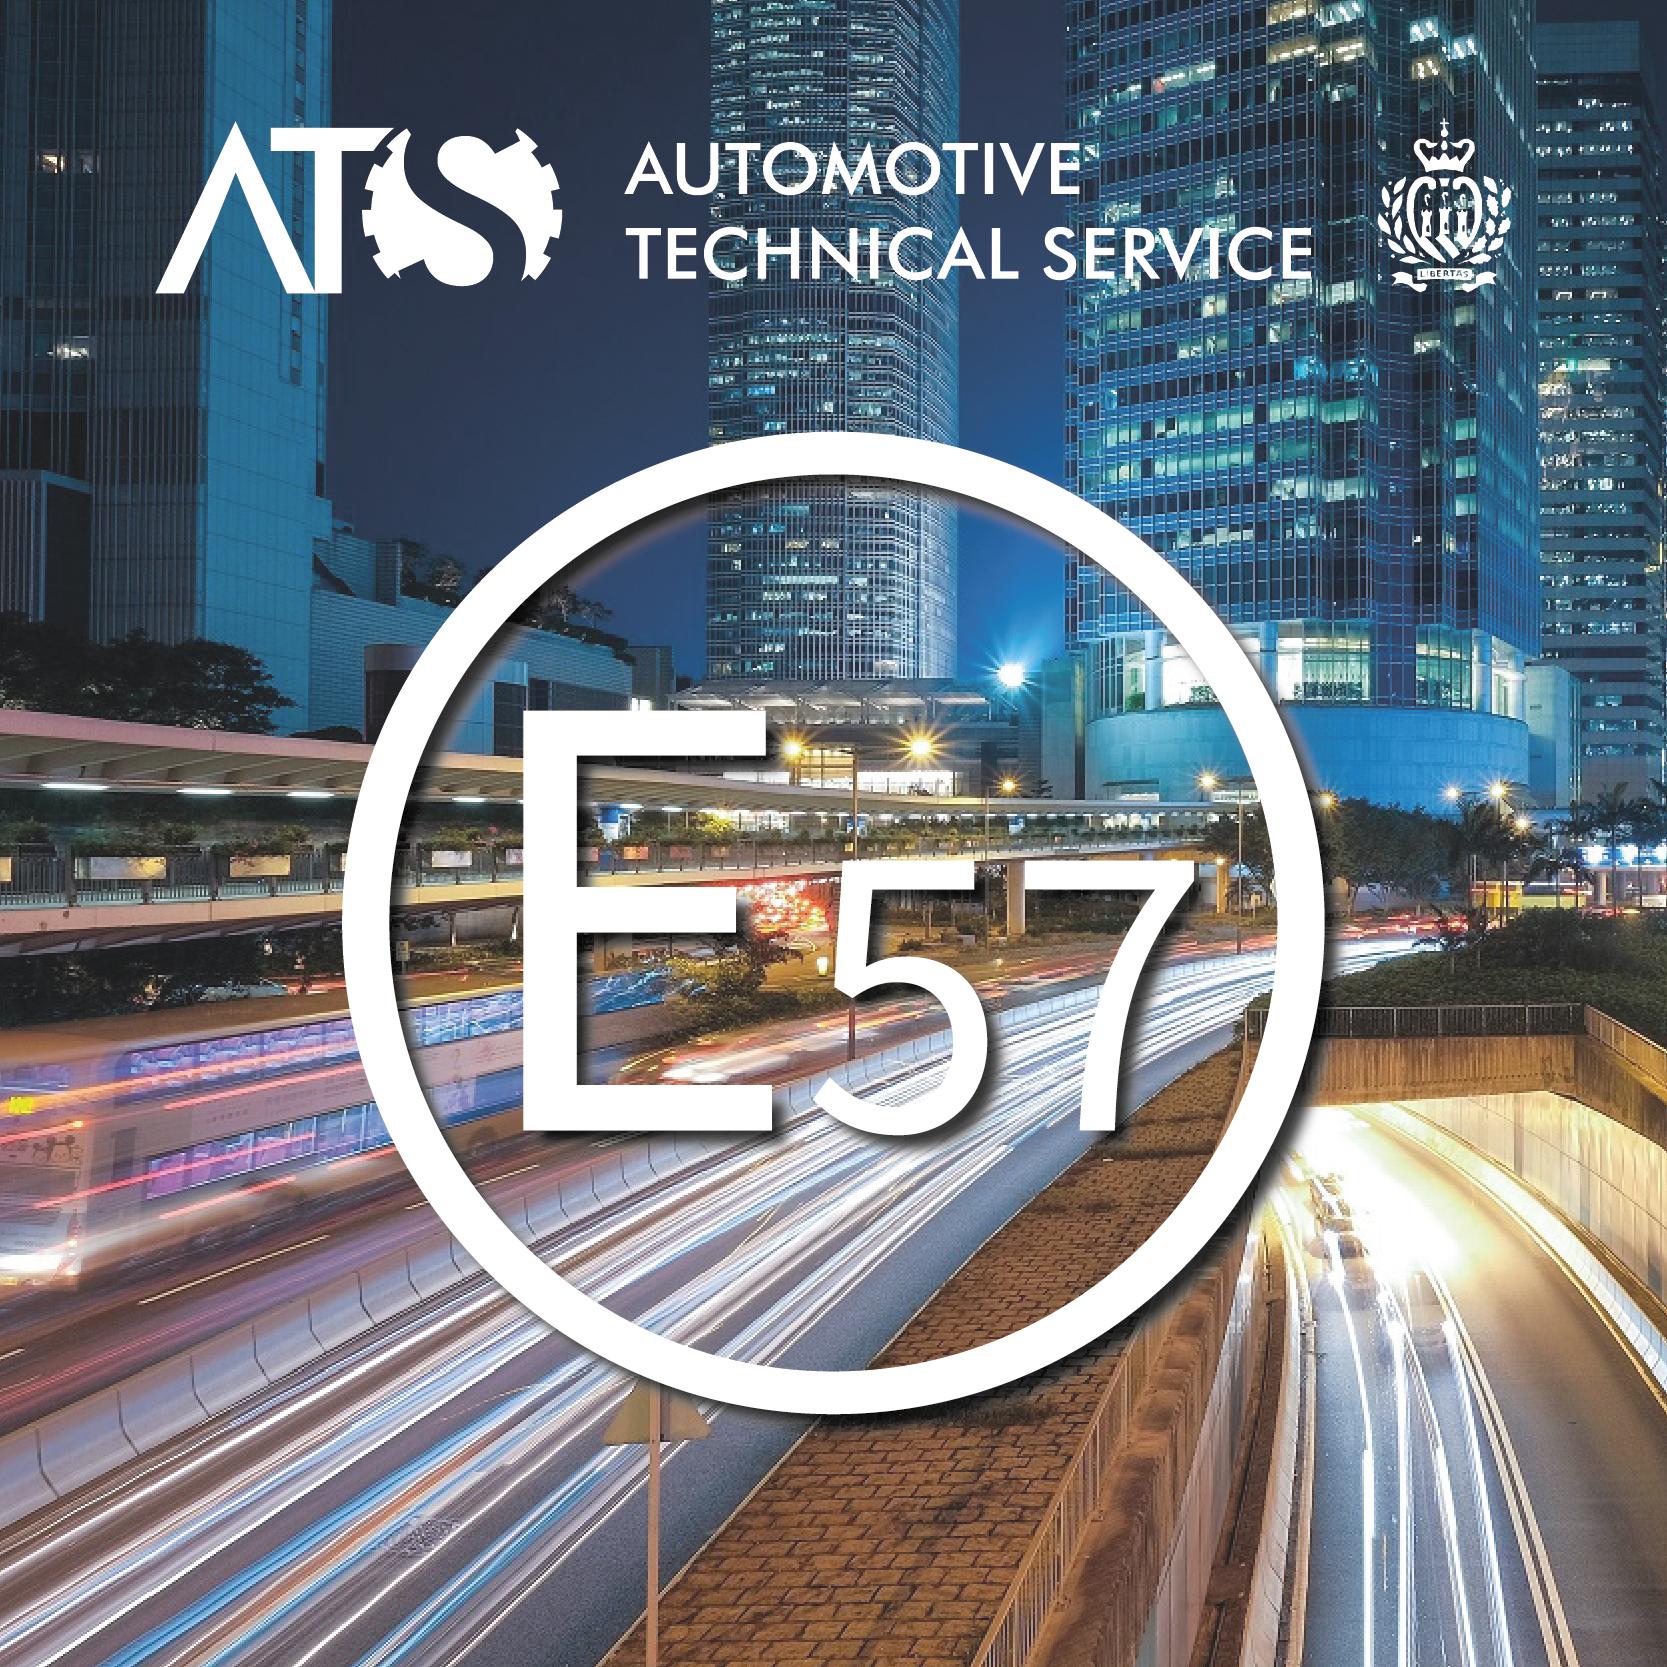 E57 ats certificazione